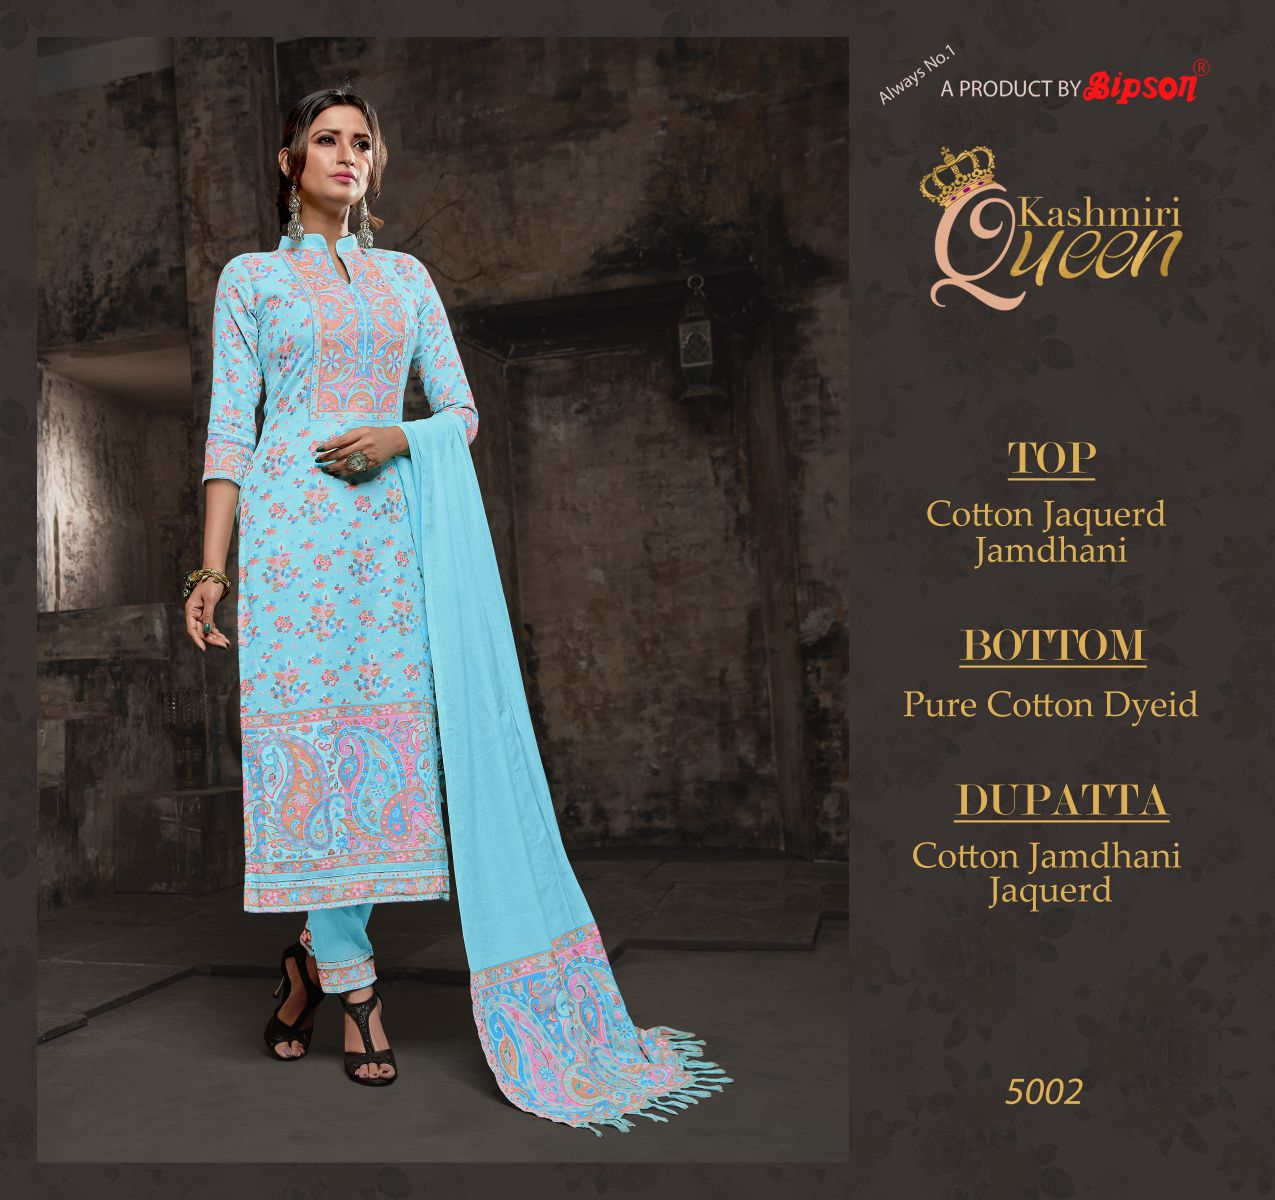 Bipson Kashmiri Queen 5002